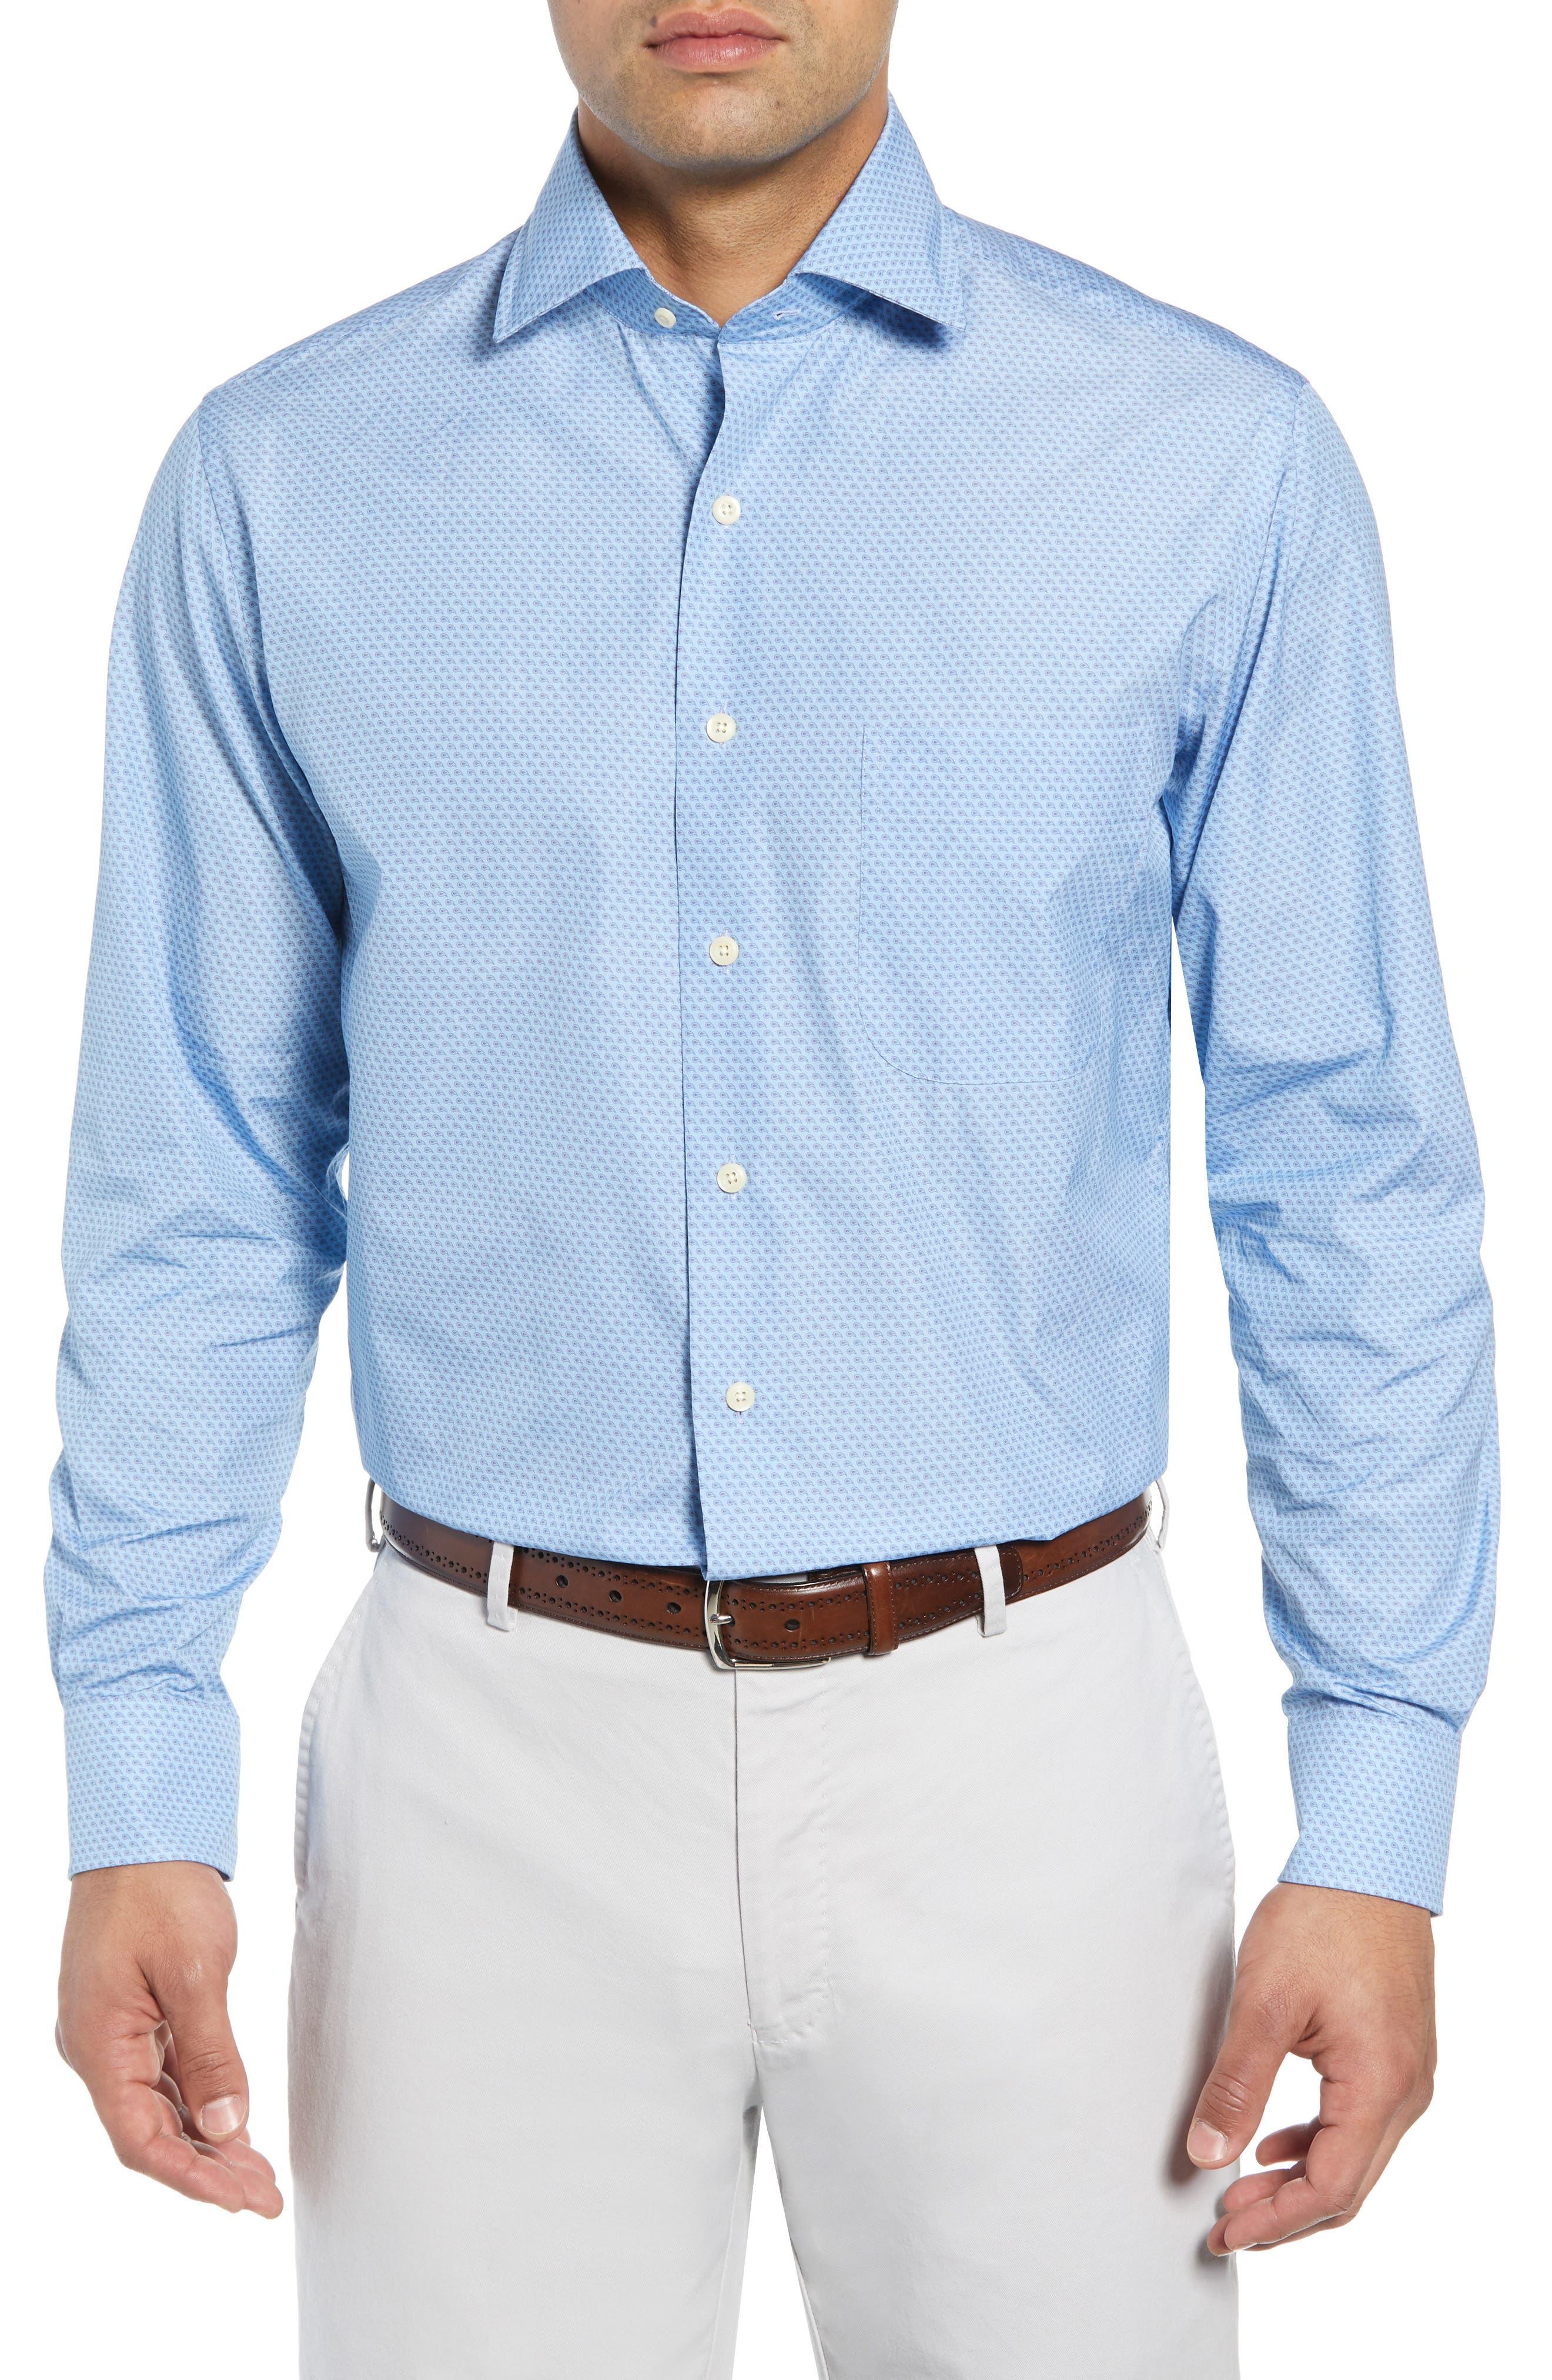 Niblick Regular Fit Sport Shirt,                         Main,                         color, BLUE